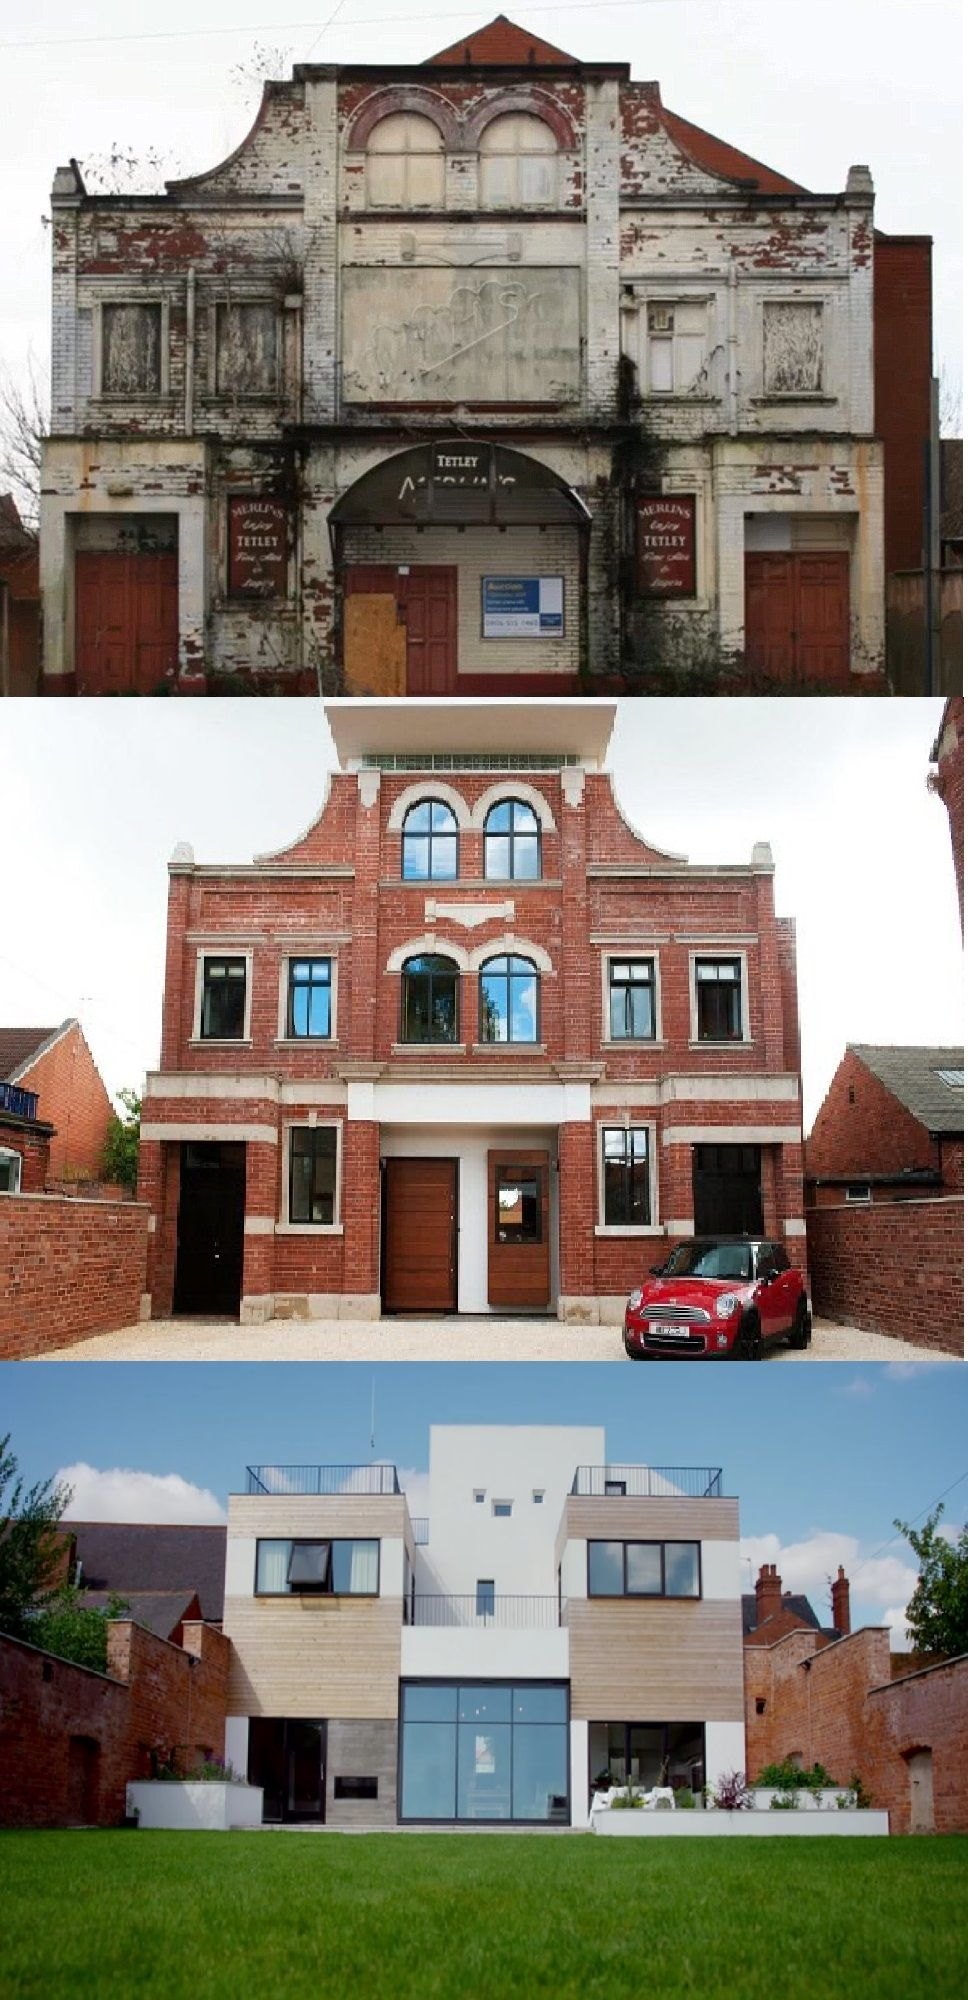 reforma grand designs south yorkshire reforma de cinema para casa